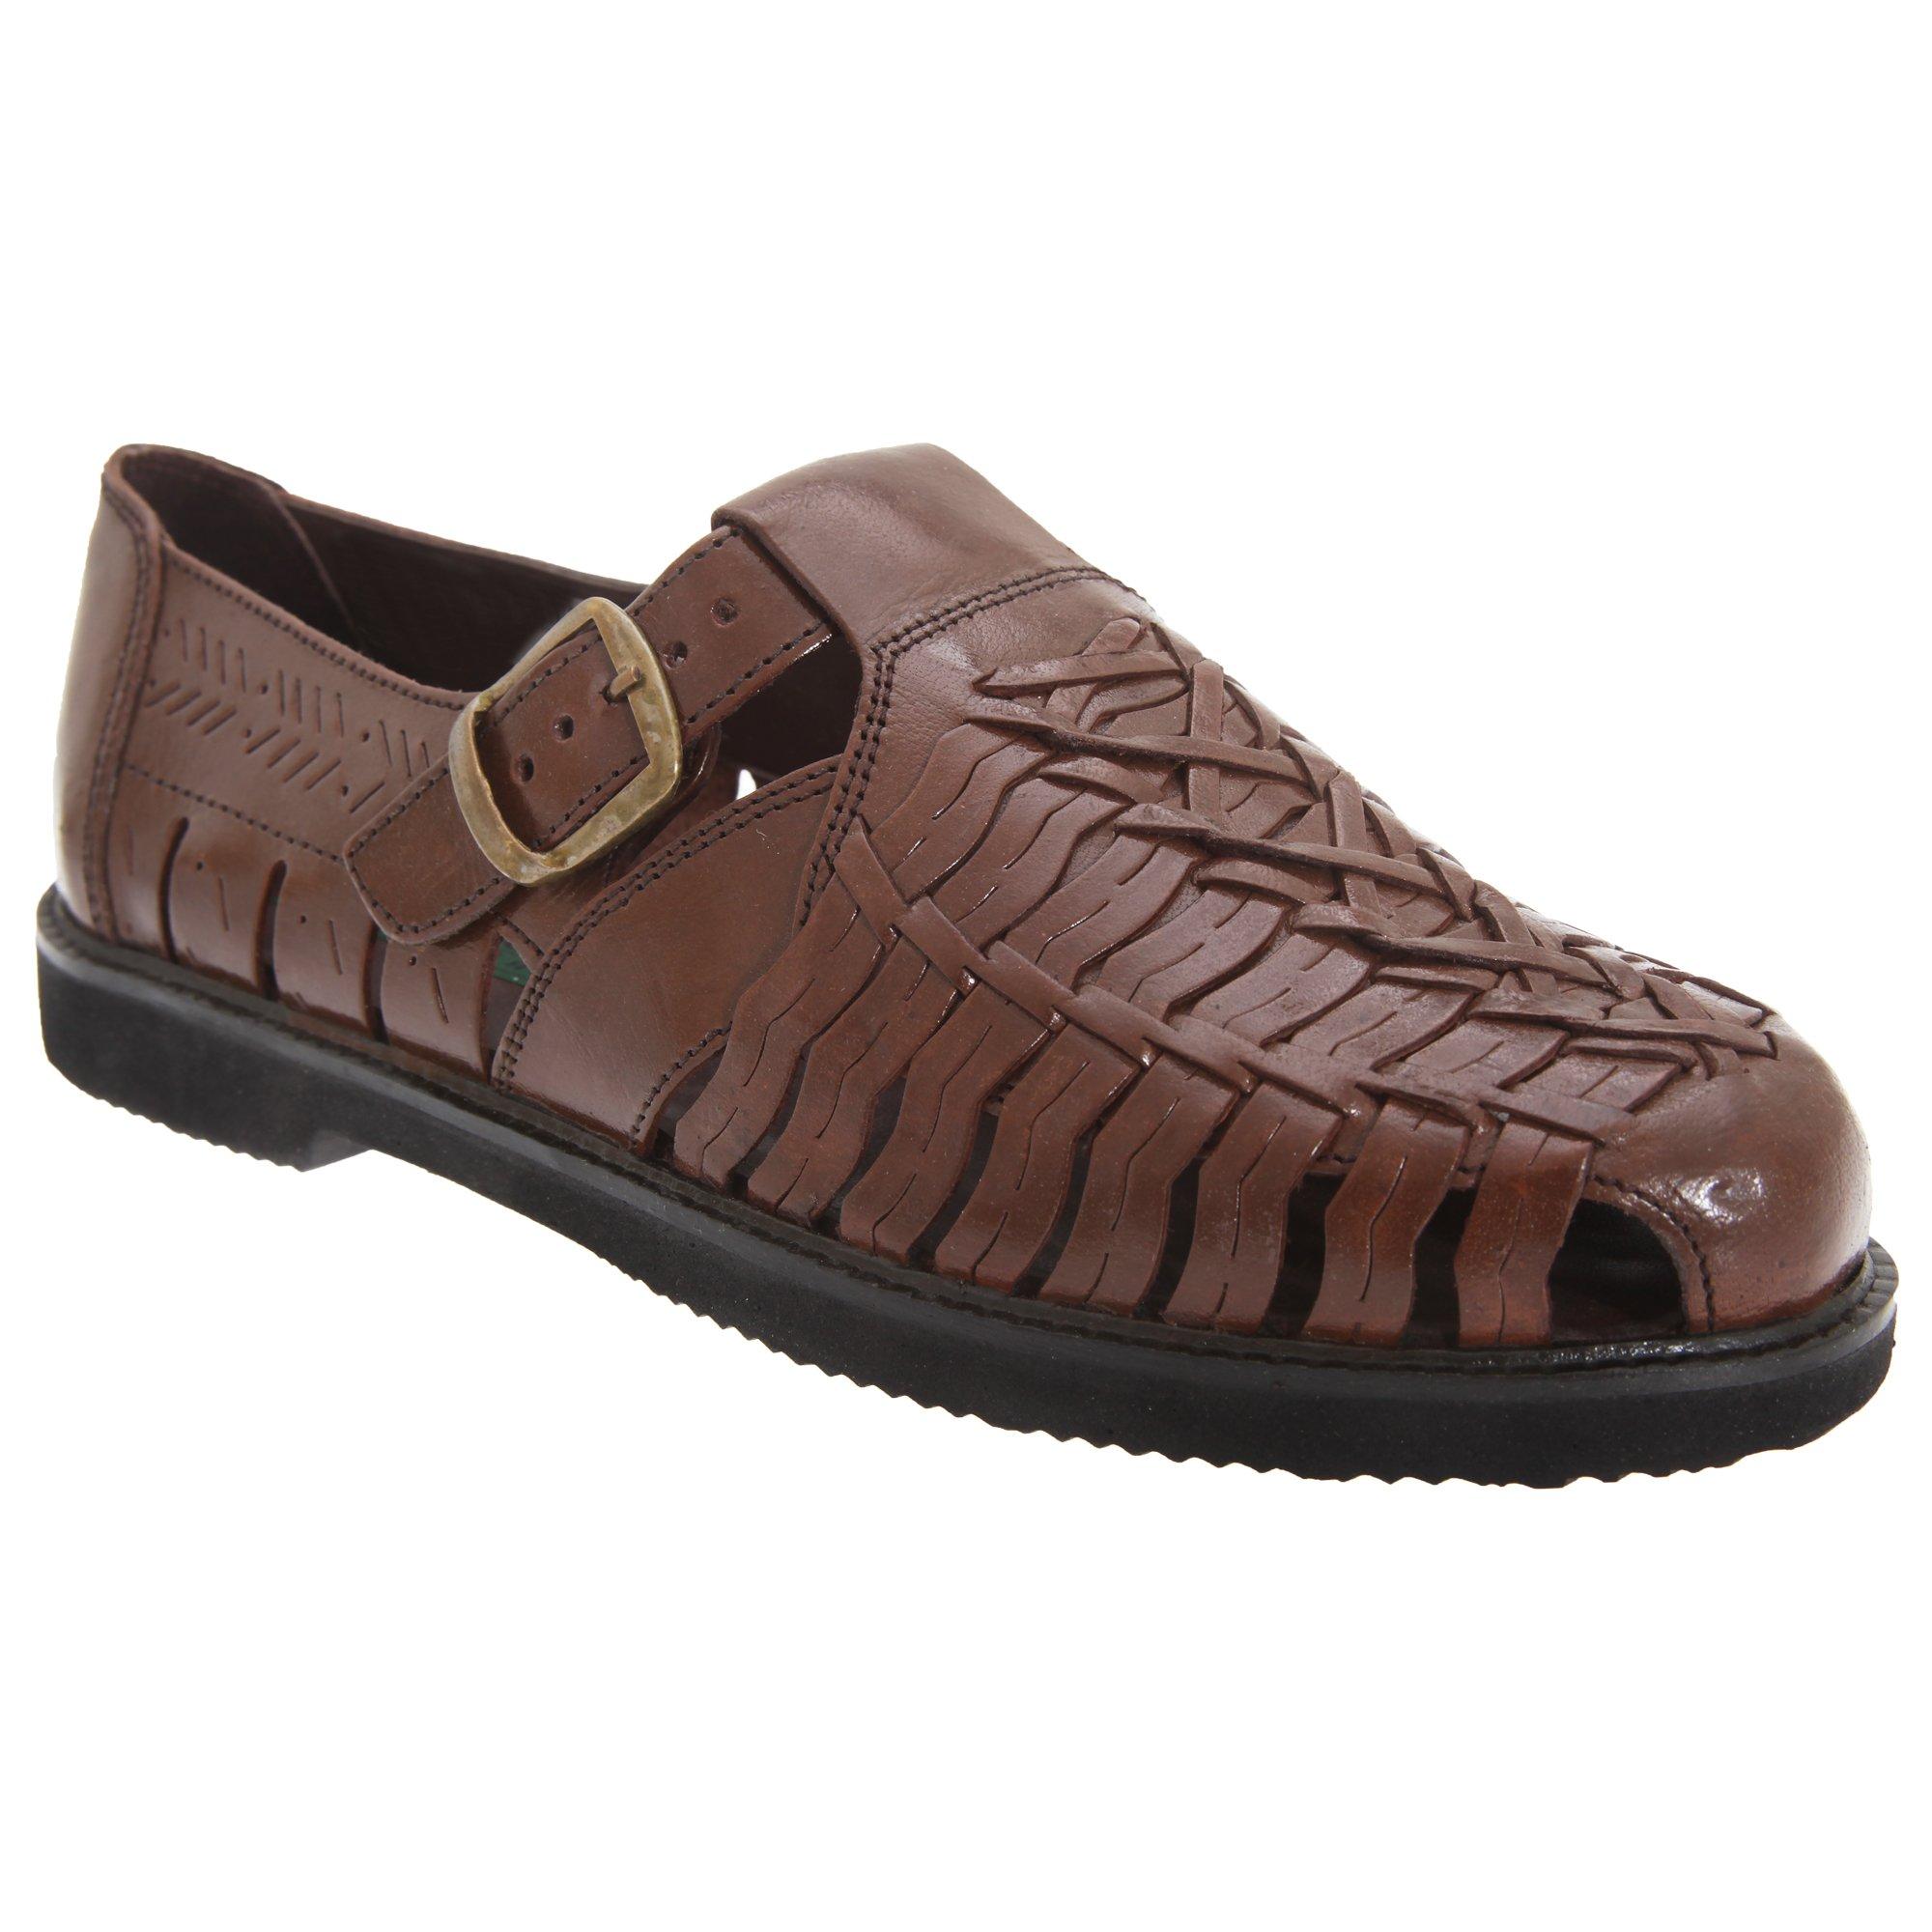 Gordini Mens Leather Interlaced Sandals (11 US) (Brown)